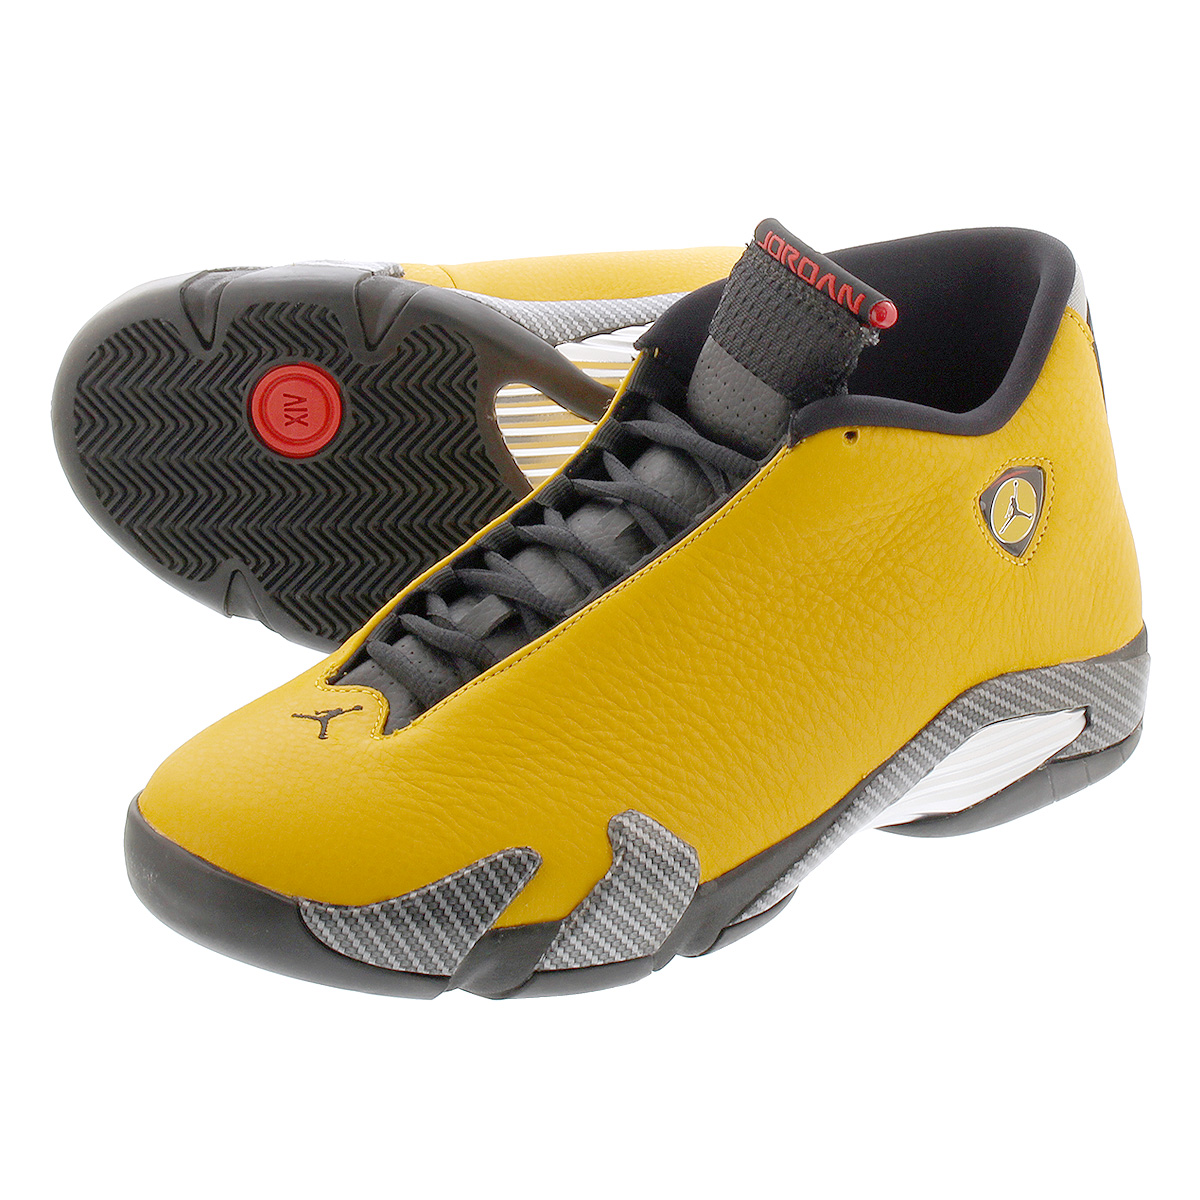 low priced a1aa6 a5254 NIKE AIR JORDAN 14 RETRO Nike Air Jordan 14 nostalgic UNIVERSITY  GOLD/BLACK/RED bq3685-706